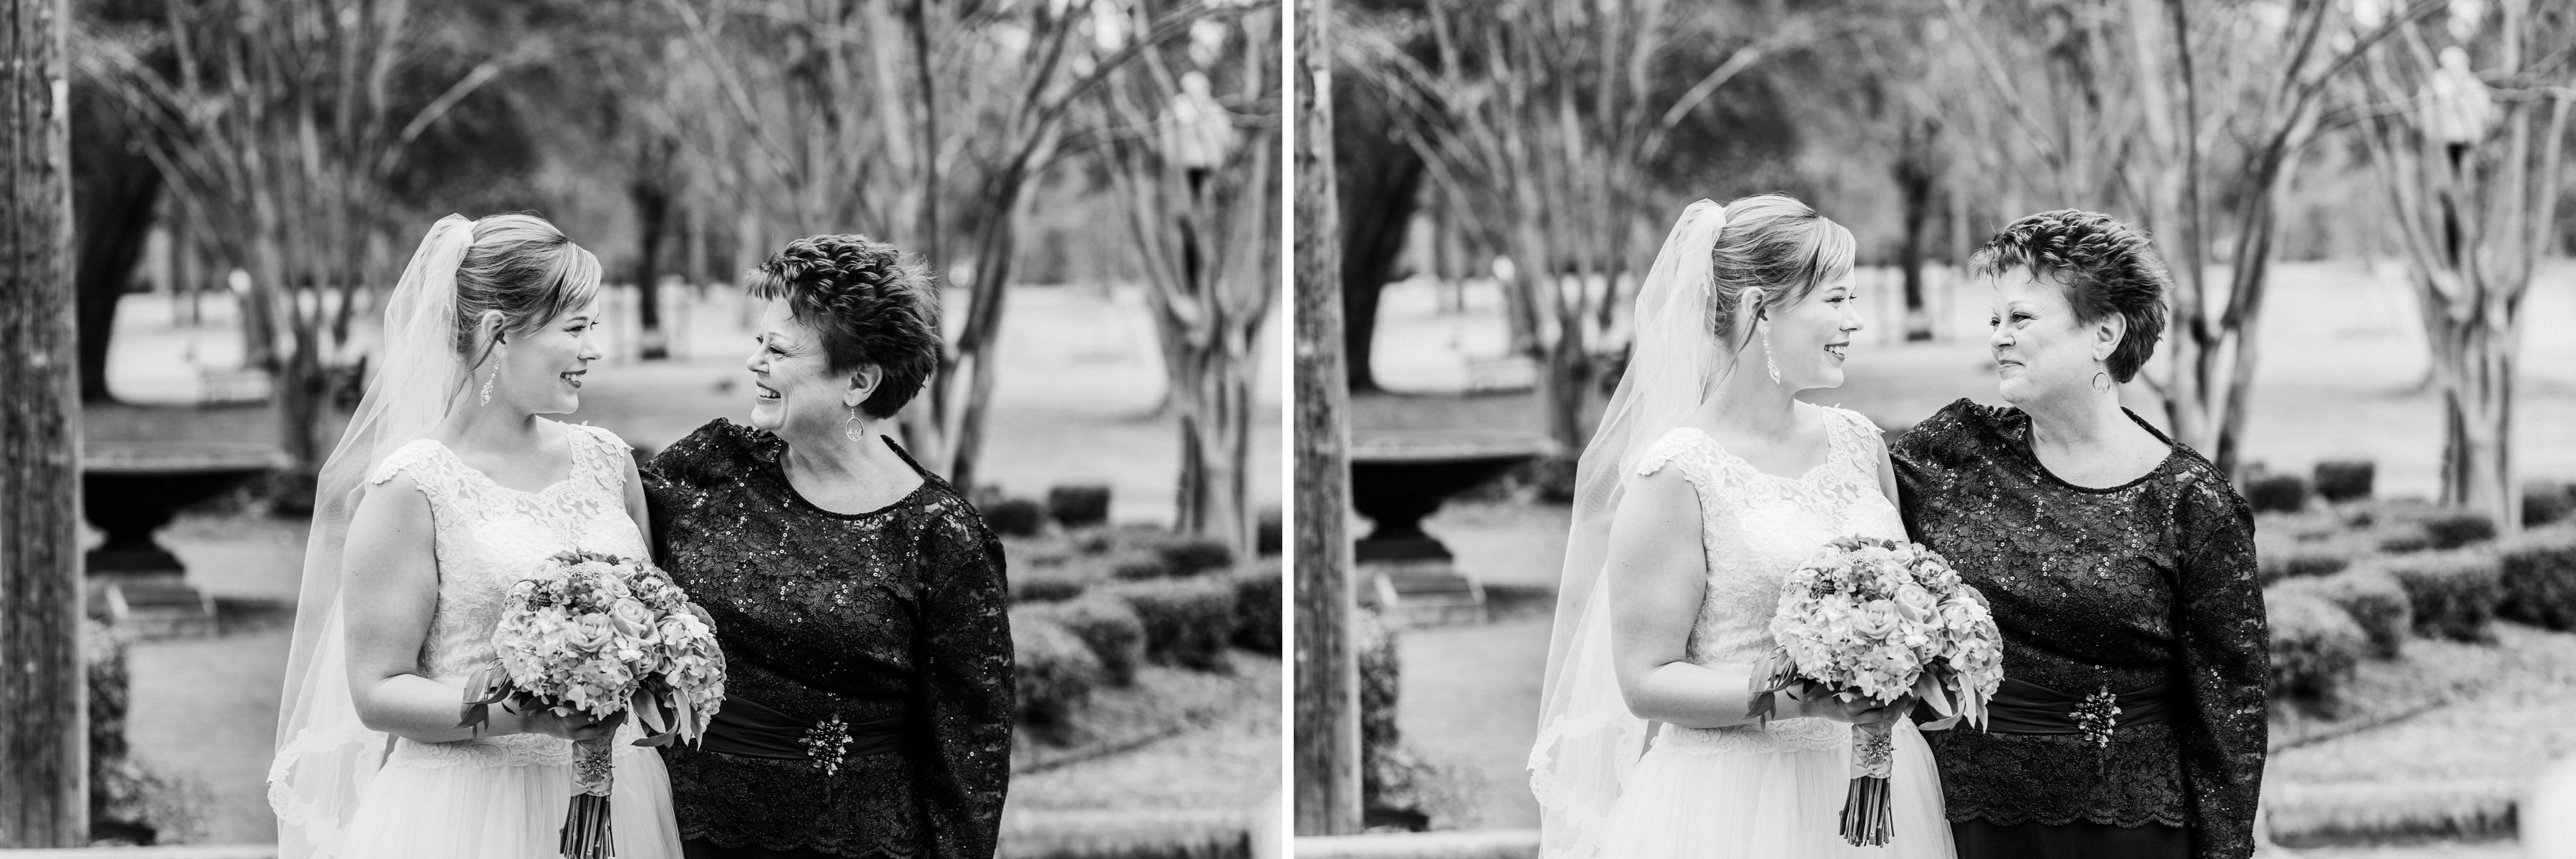 MAULDIN_WEDDING_MONTGOMERY_ALABAMA_WEDDING_PHOTOGRAPHY_39